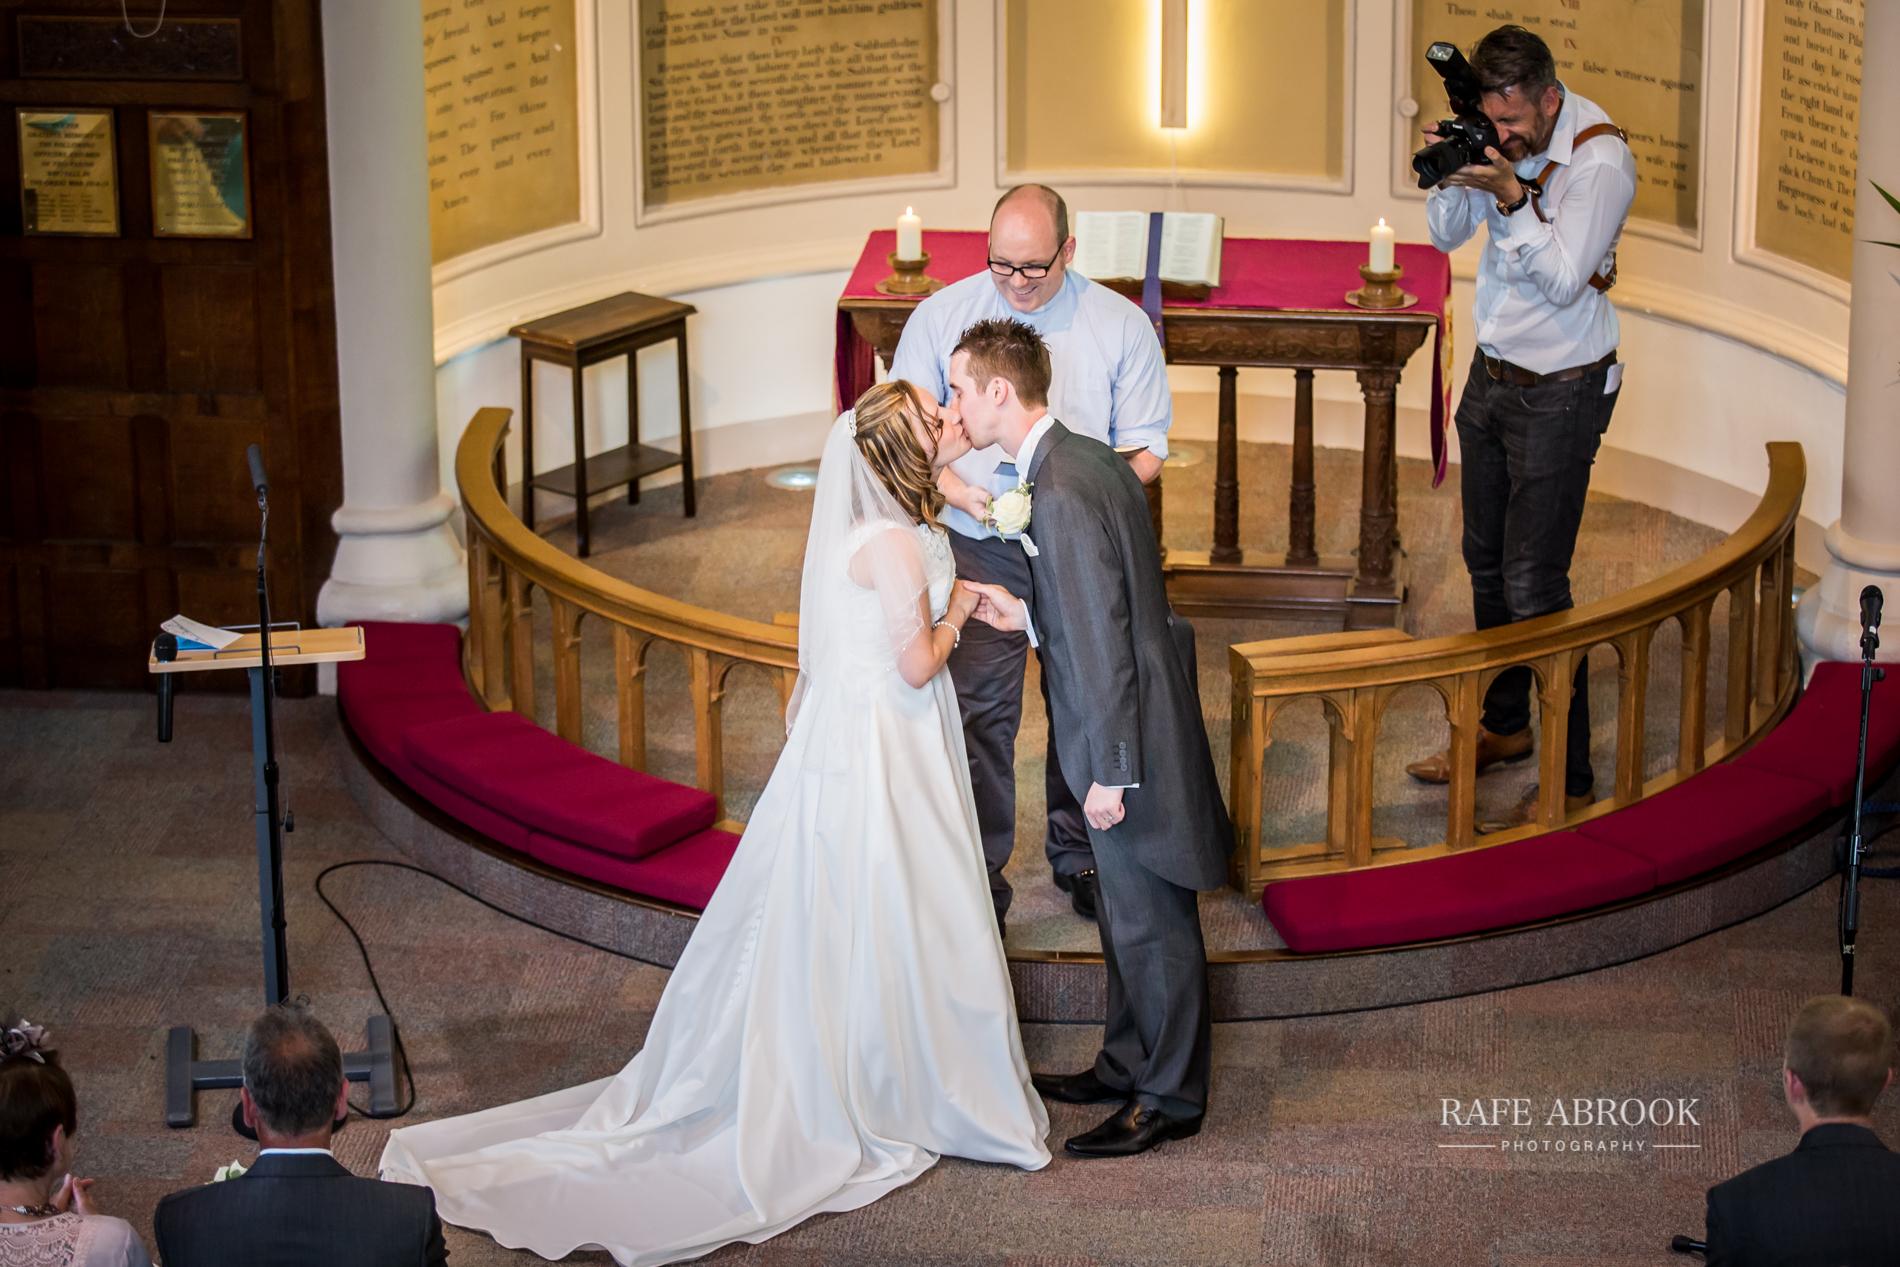 wedding photographer hertfordshire noke thistle hotel st albans -1203.jpg